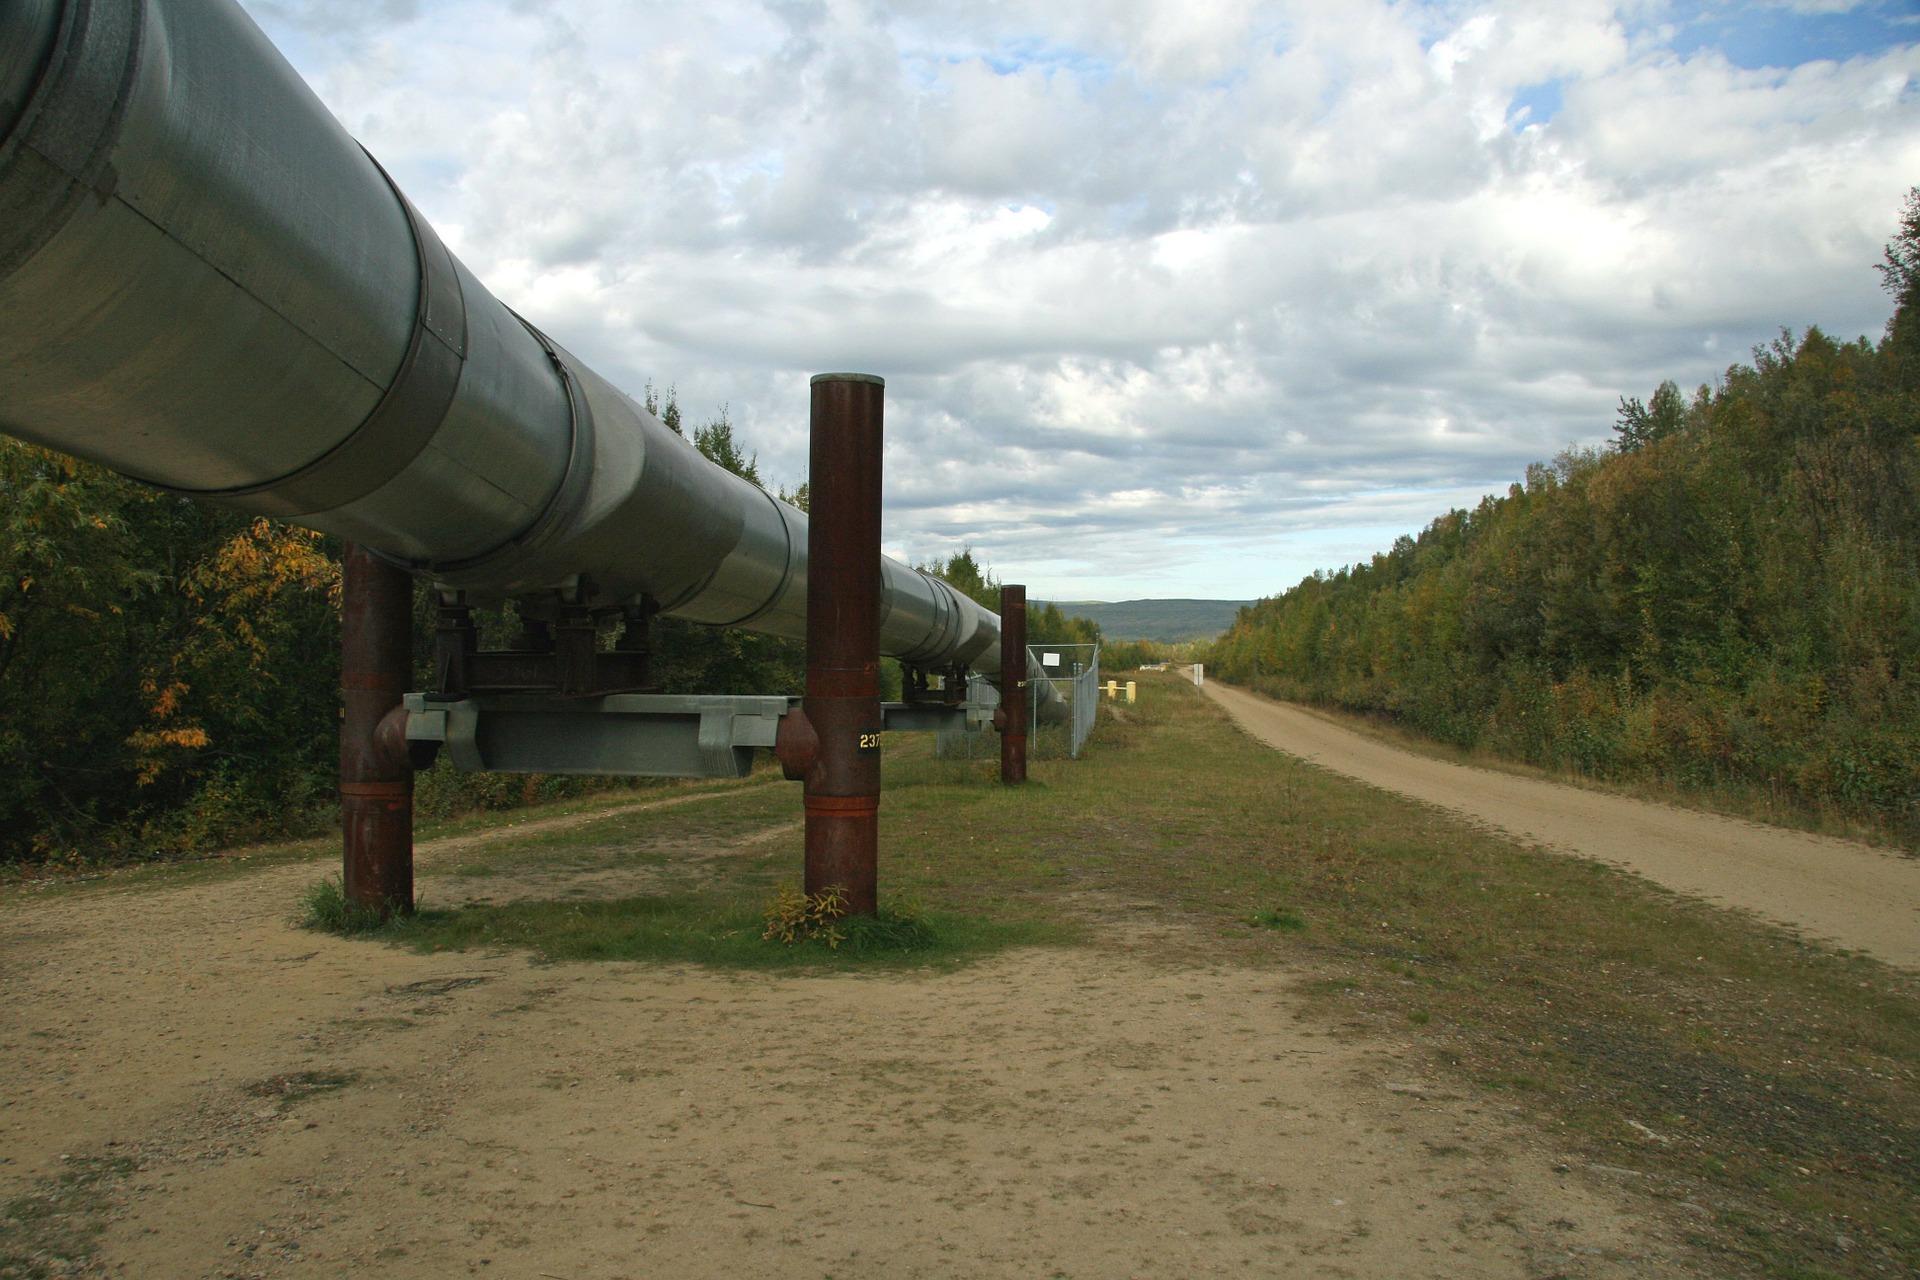 Pipeline construction.